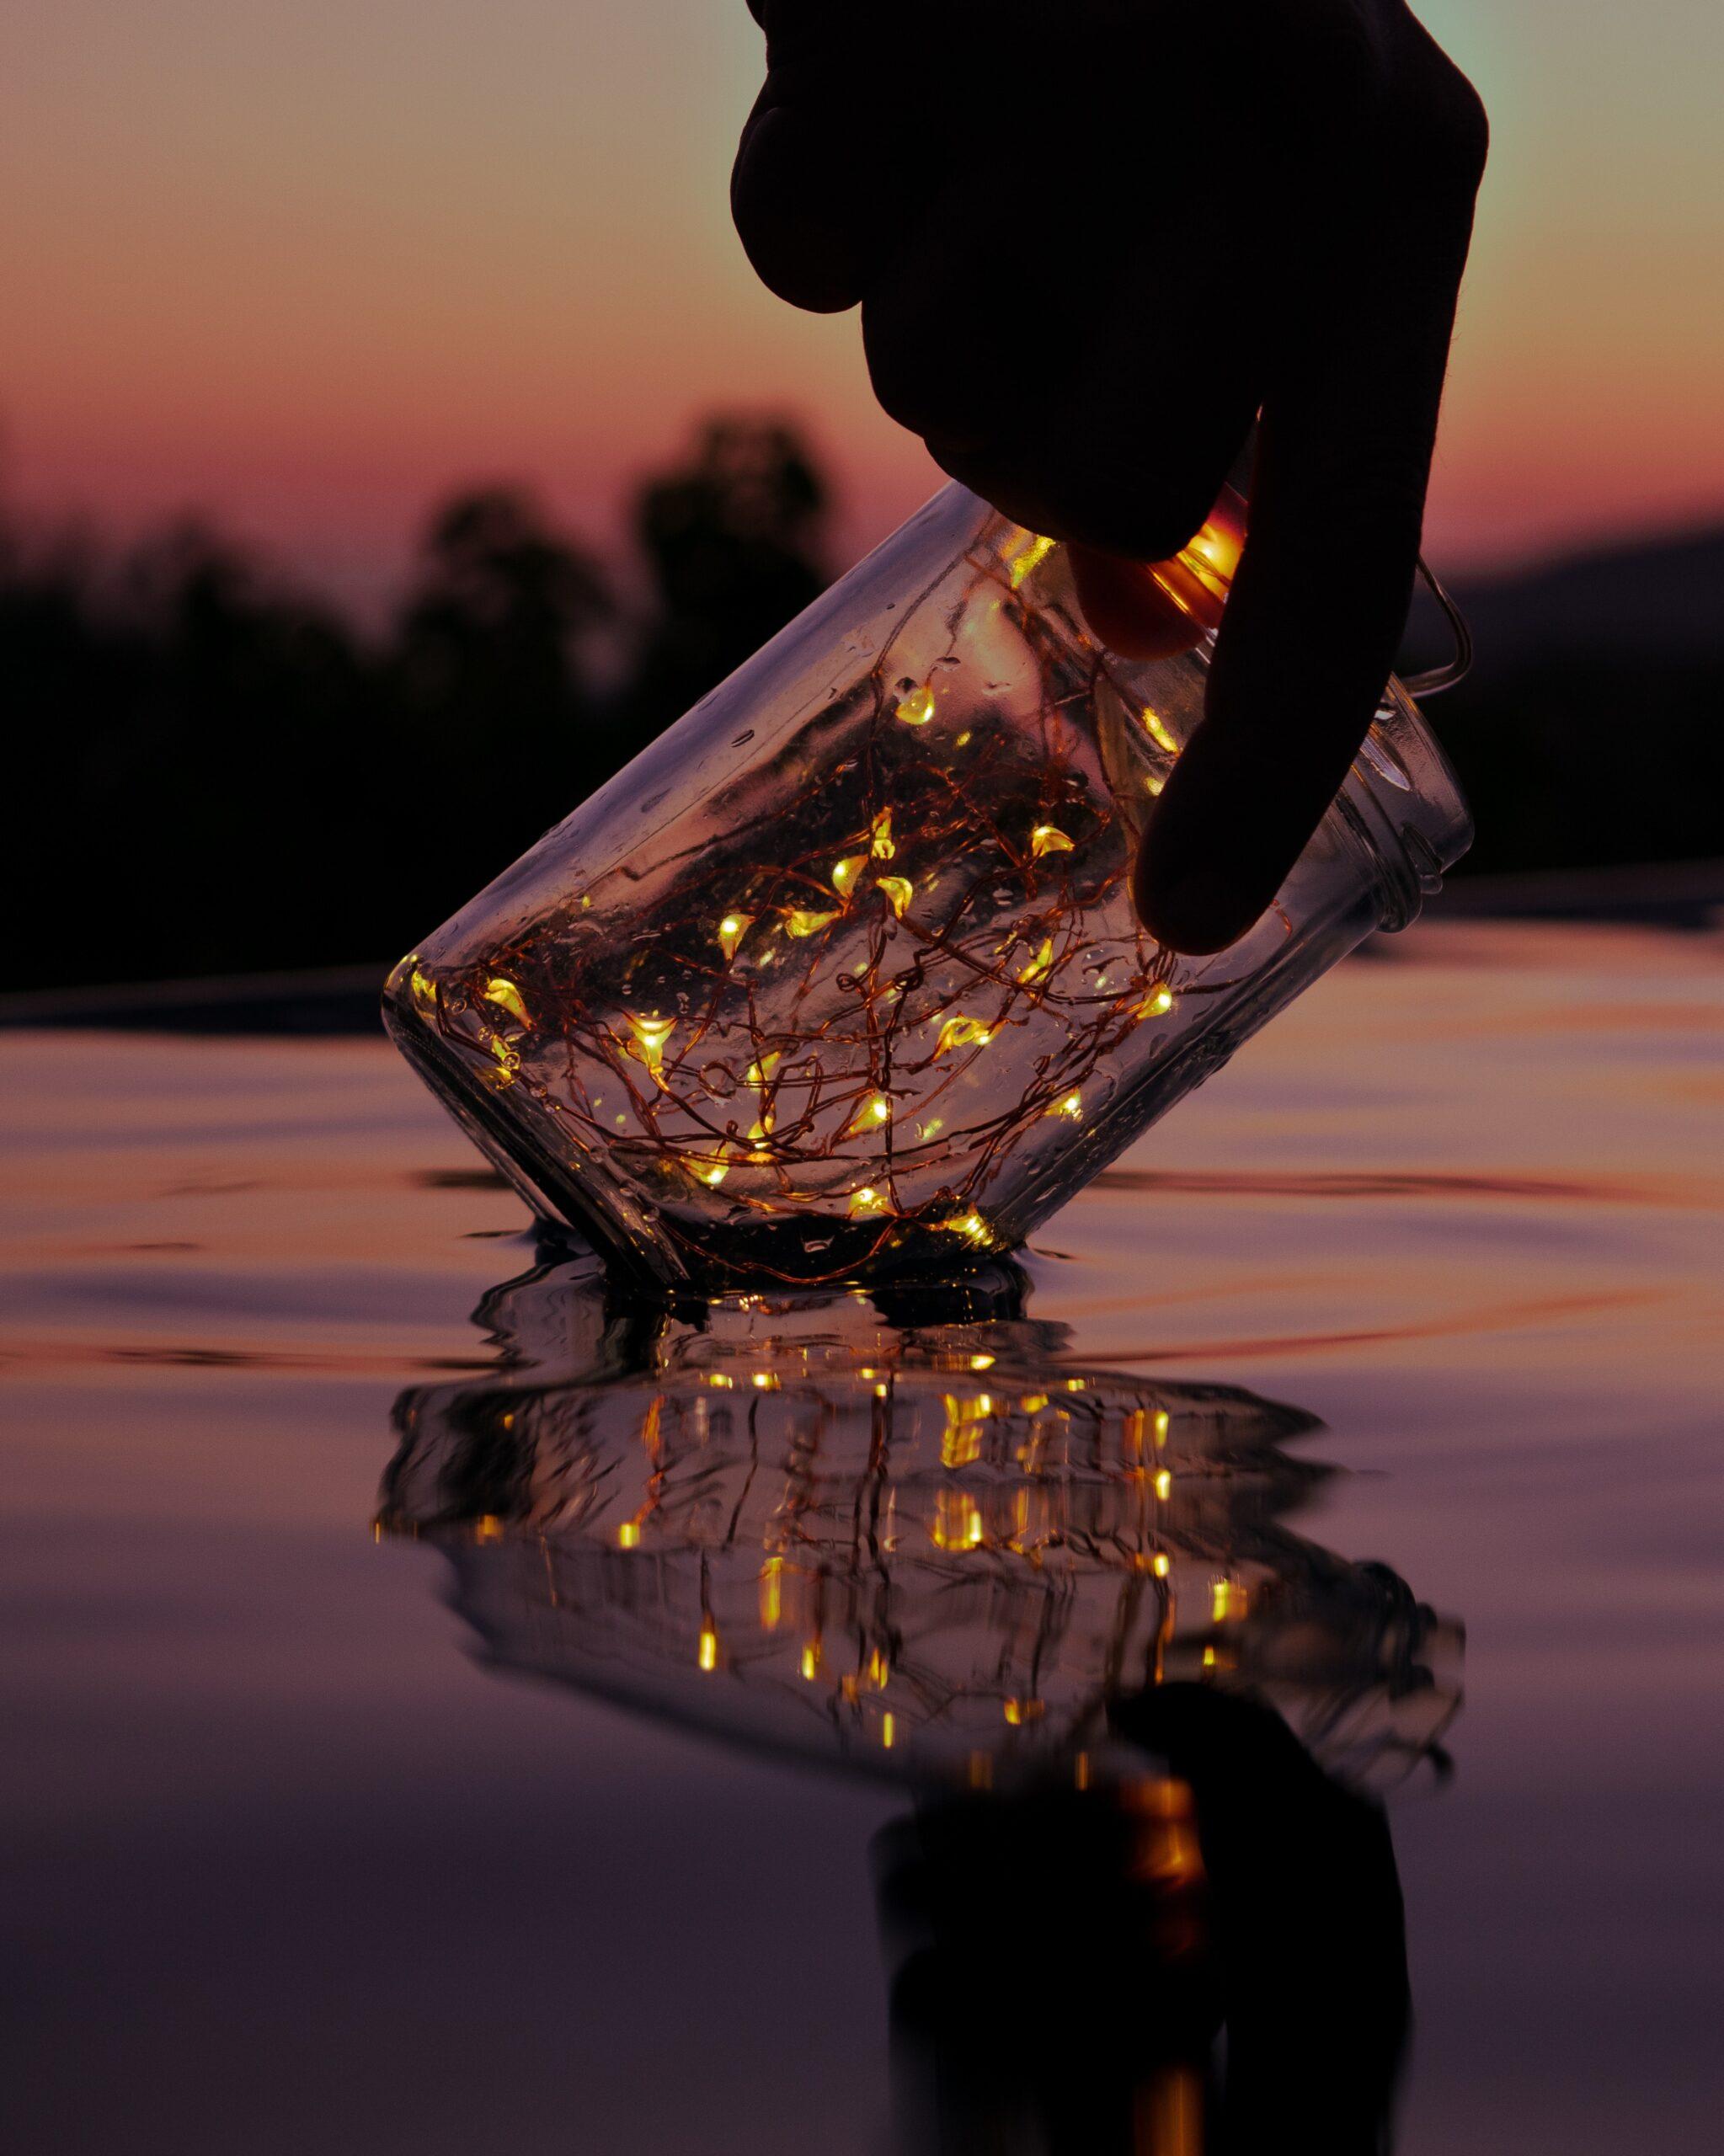 luigi-colonna-lights in a bottle held still over water-unsplash